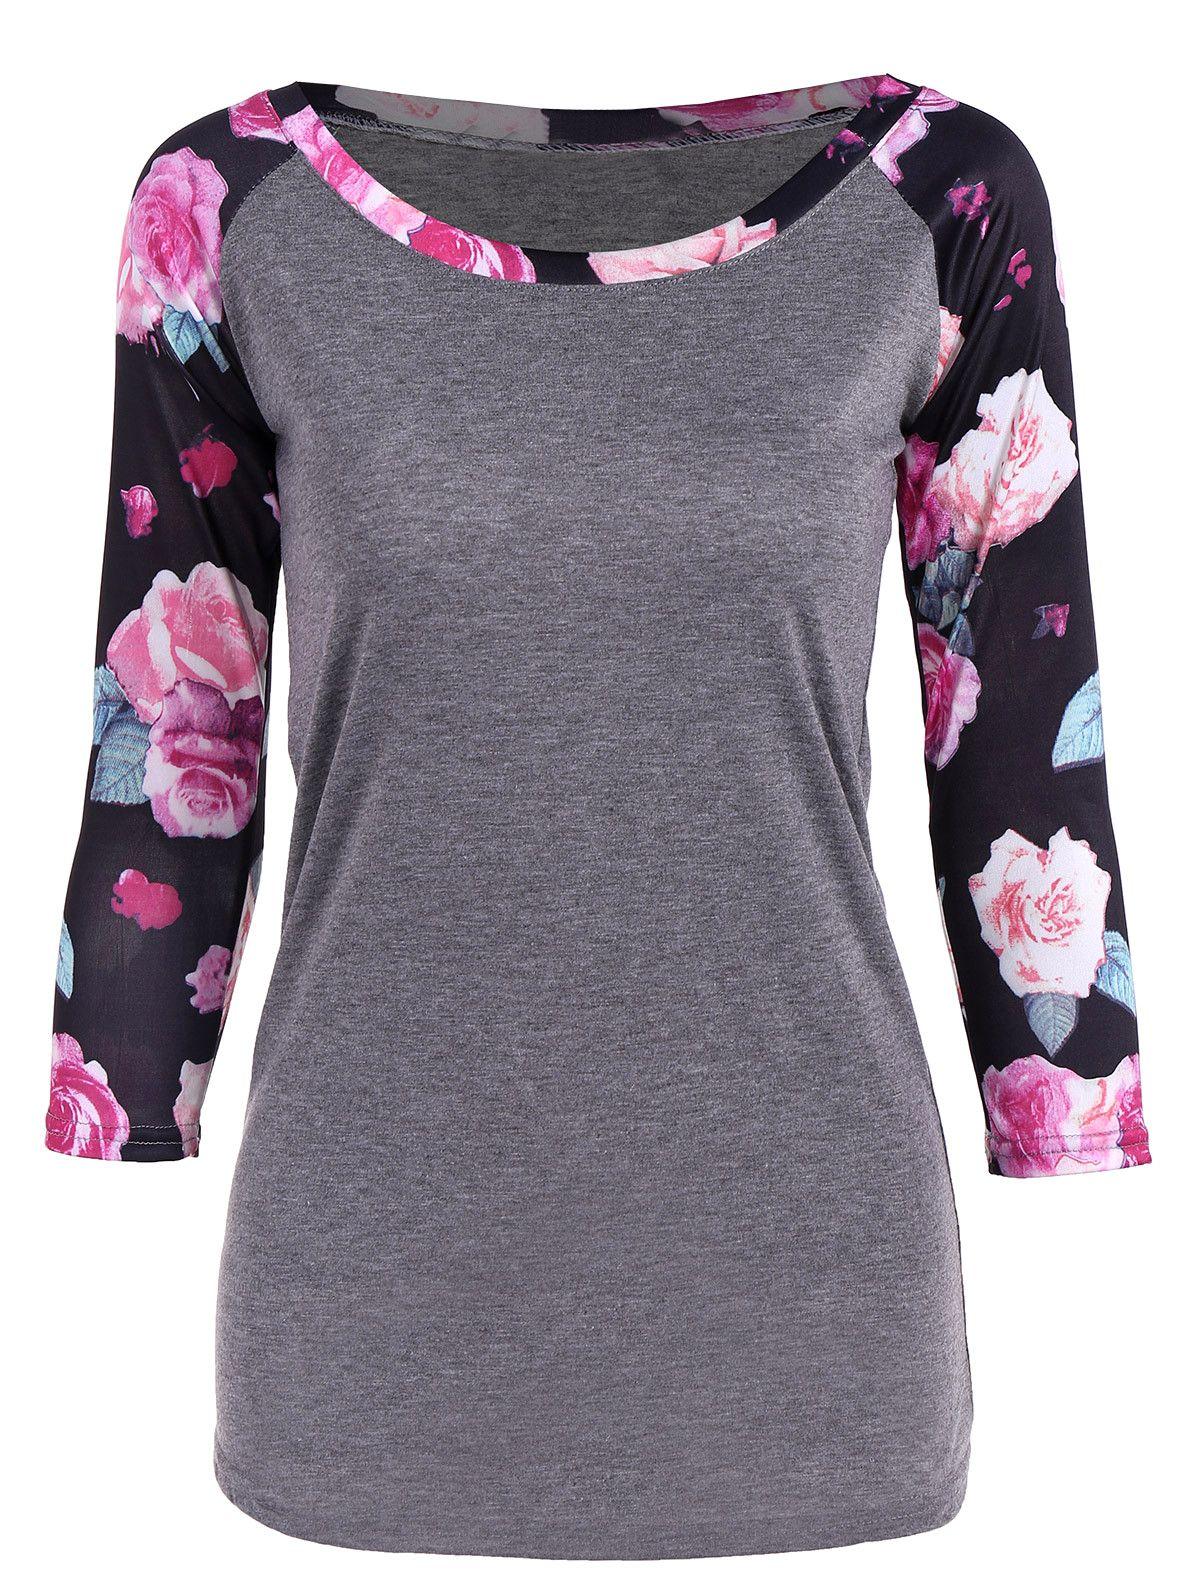 1435 floral print 34 sleeve tshirt fashion clothes